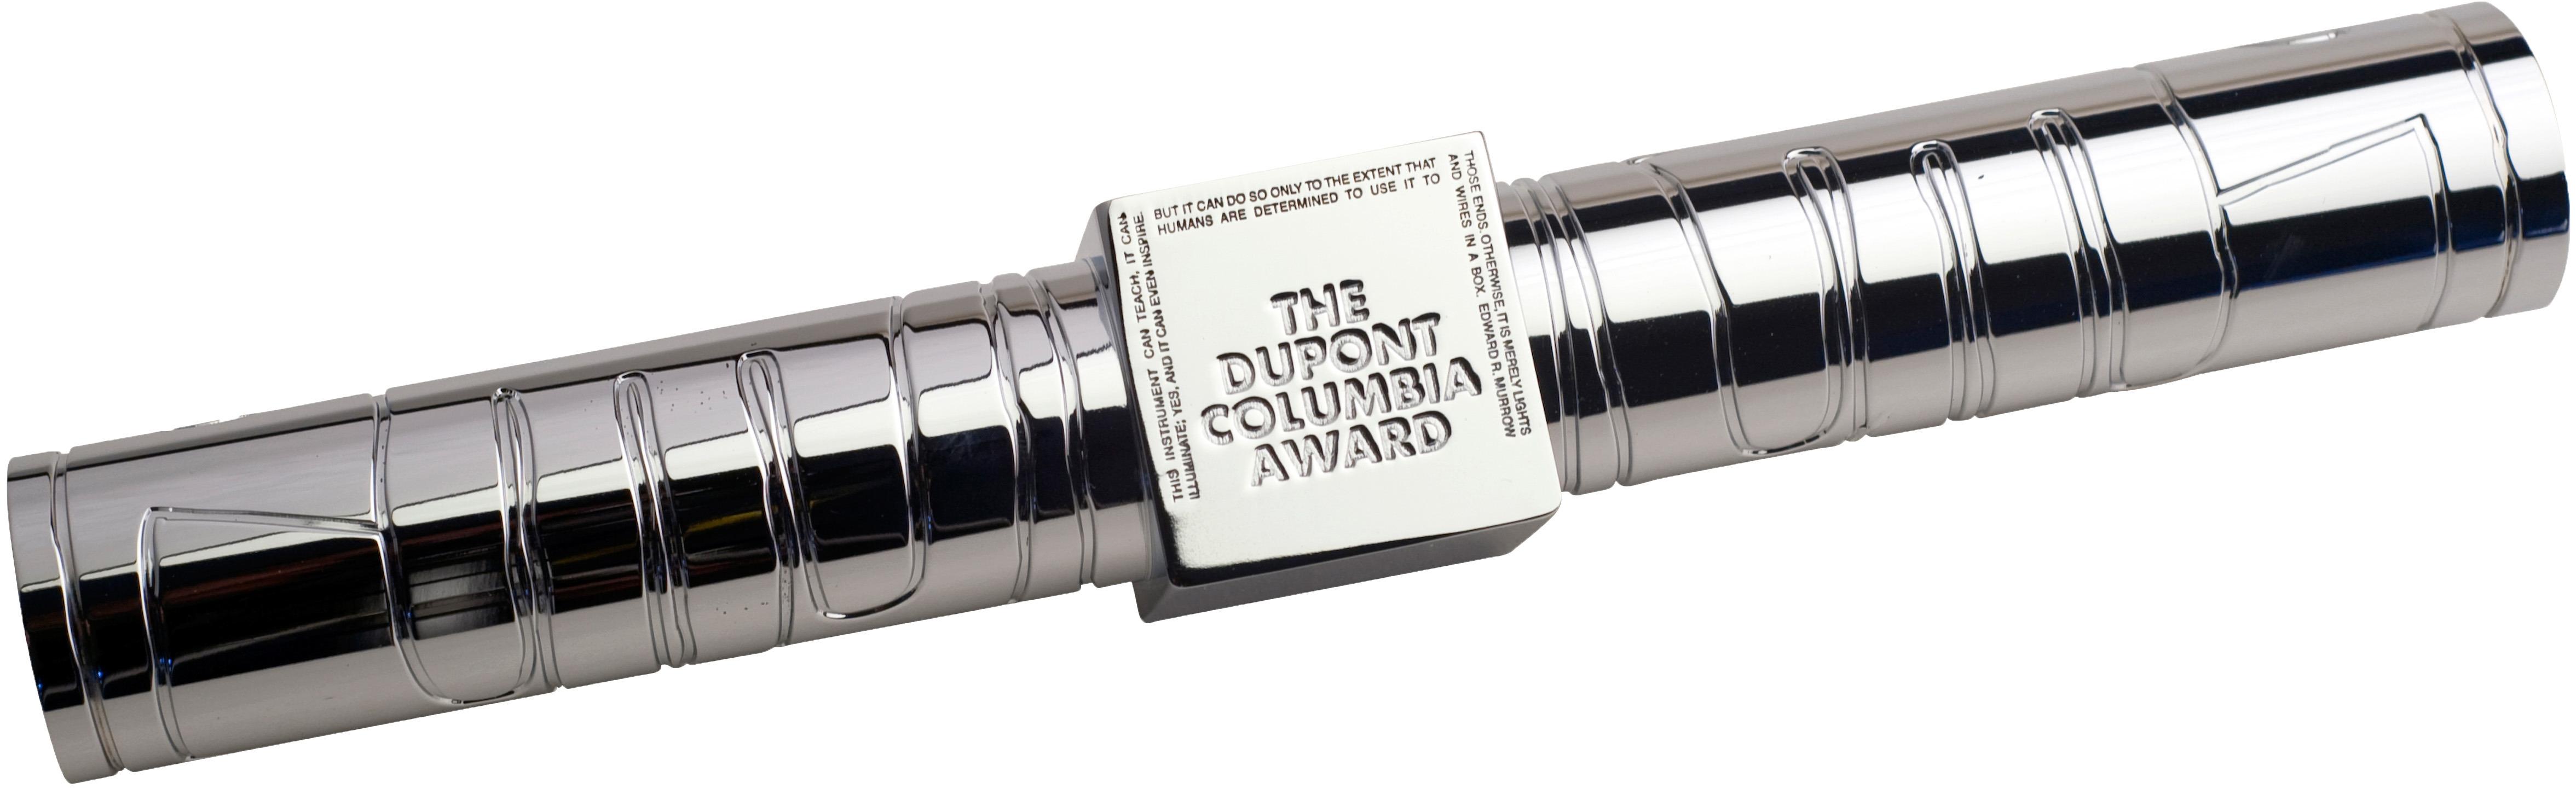 awards accomplishments al jazeera america awards accomplishments